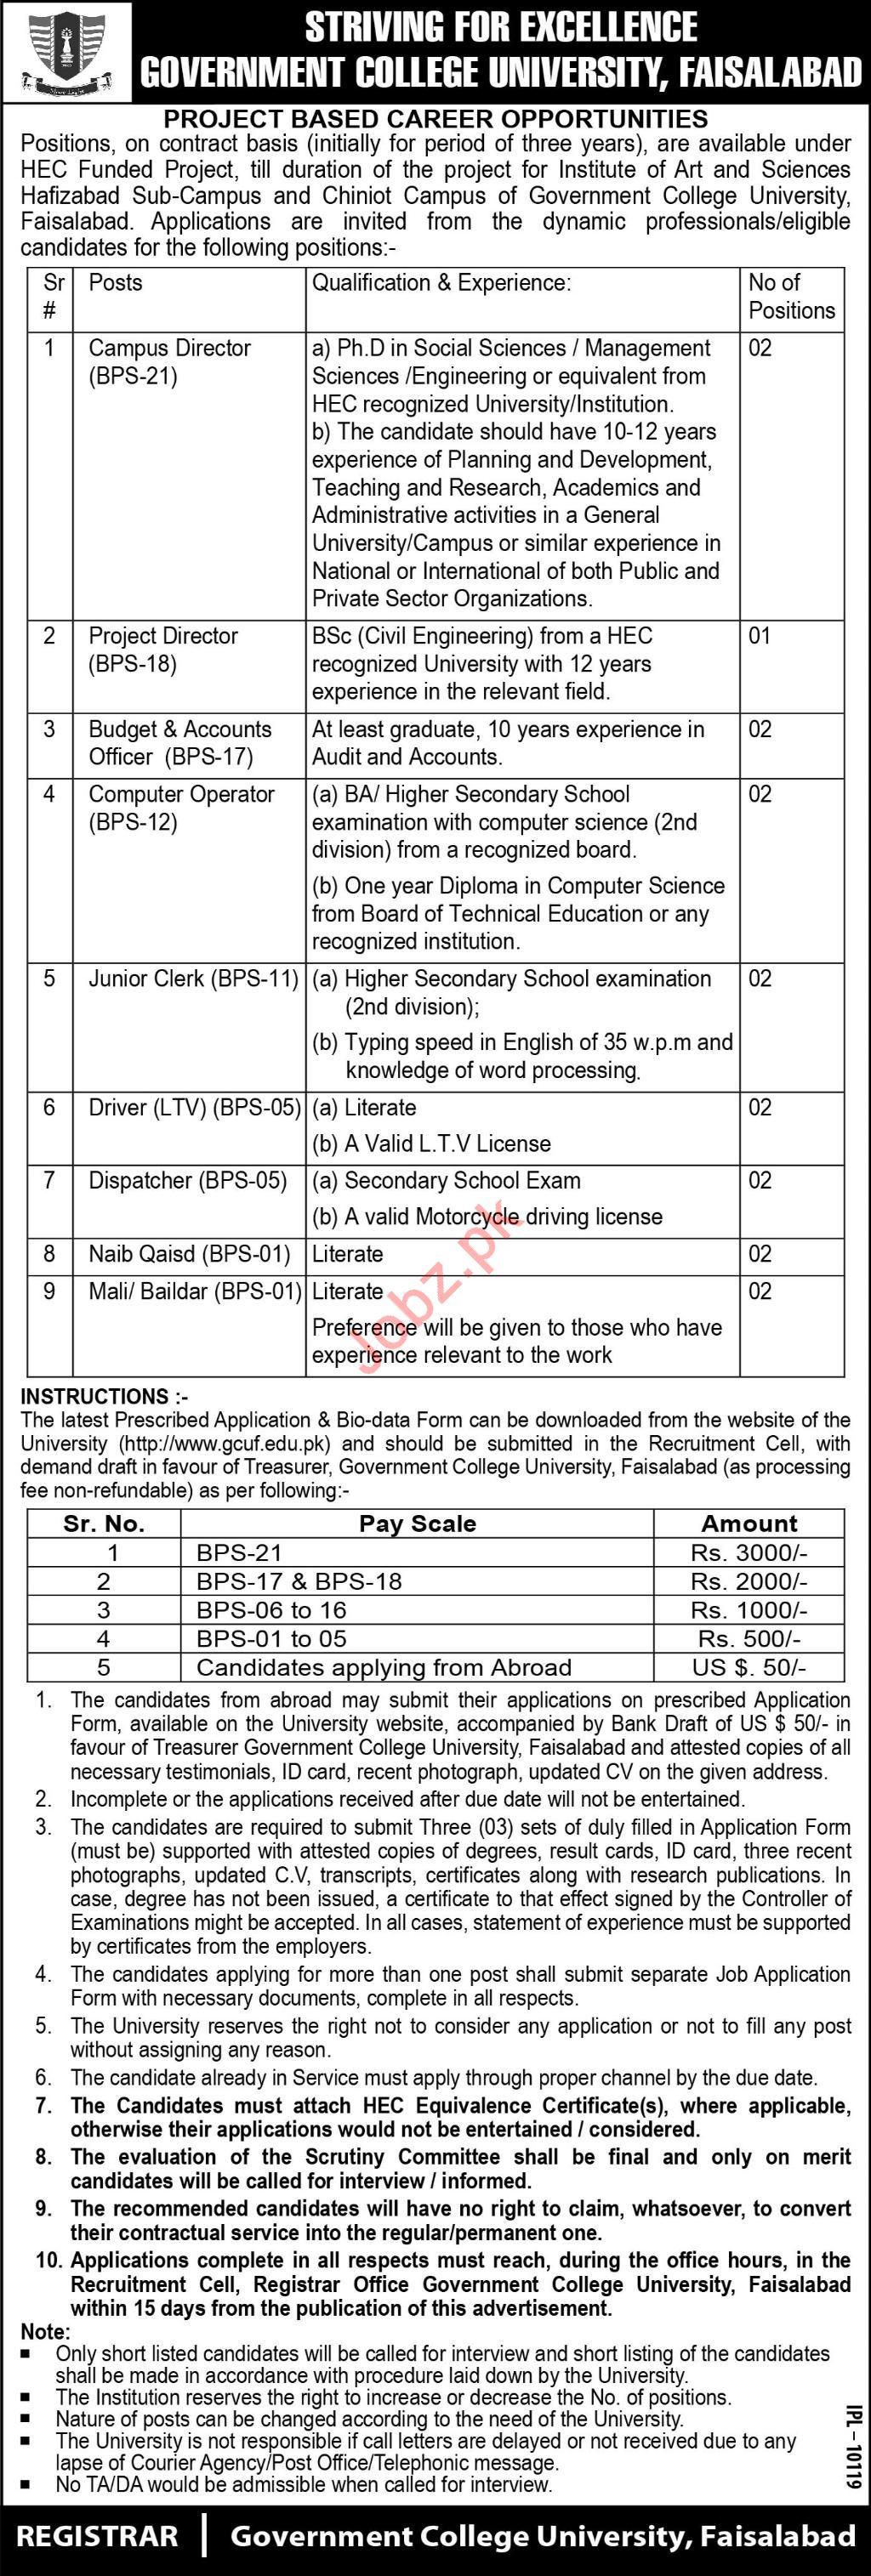 Government College University Faisalabad Jobs 2019